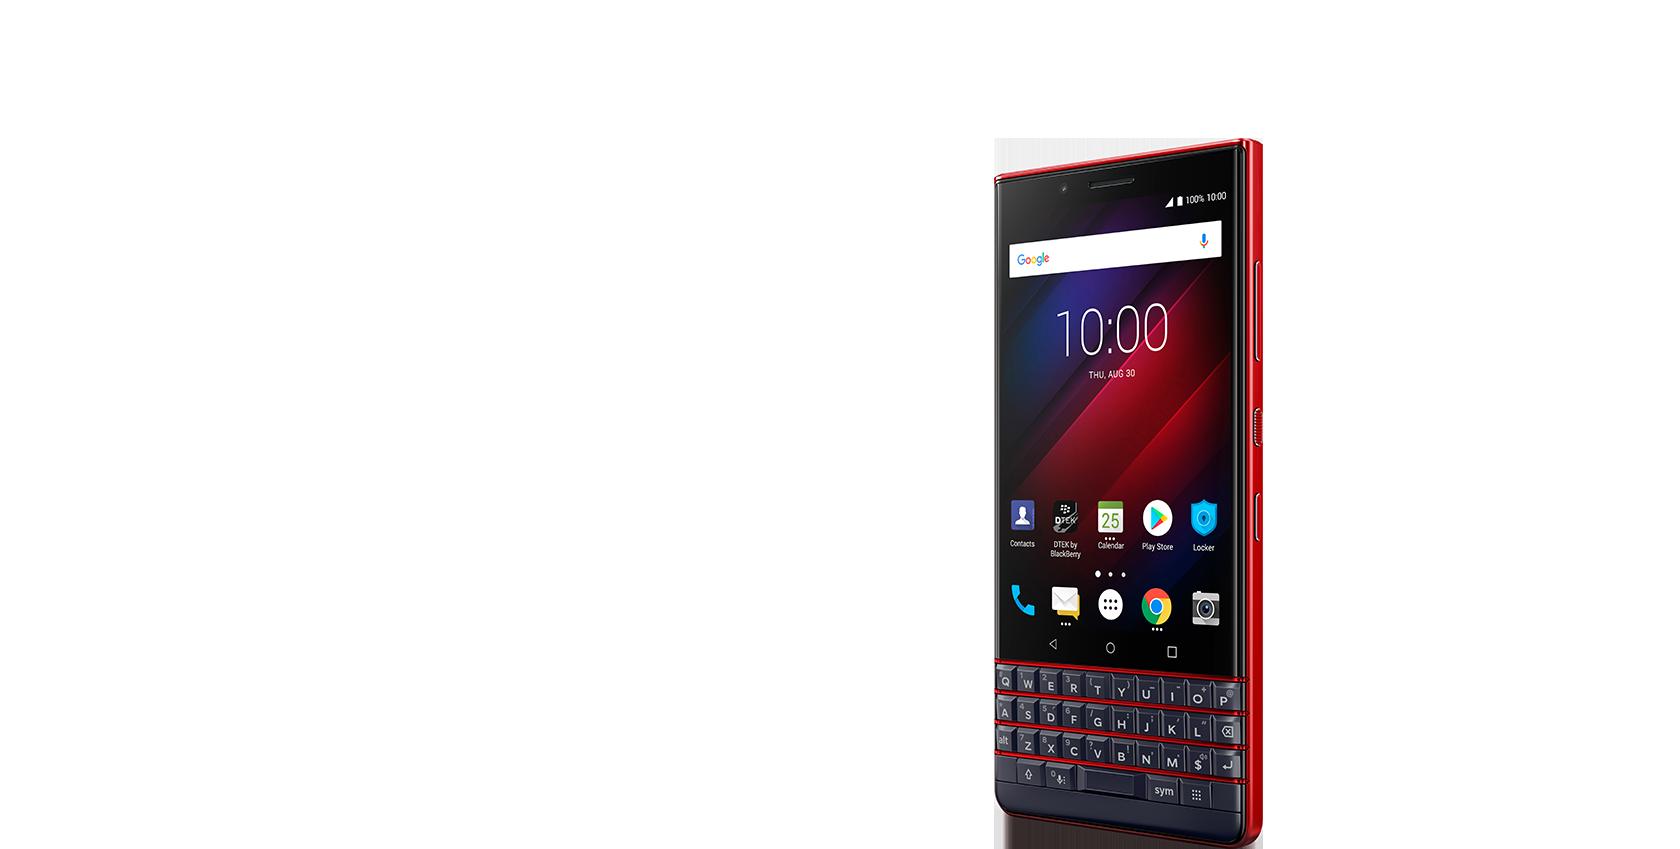 key 2 le atomic - BlackBerry KEY2 LE